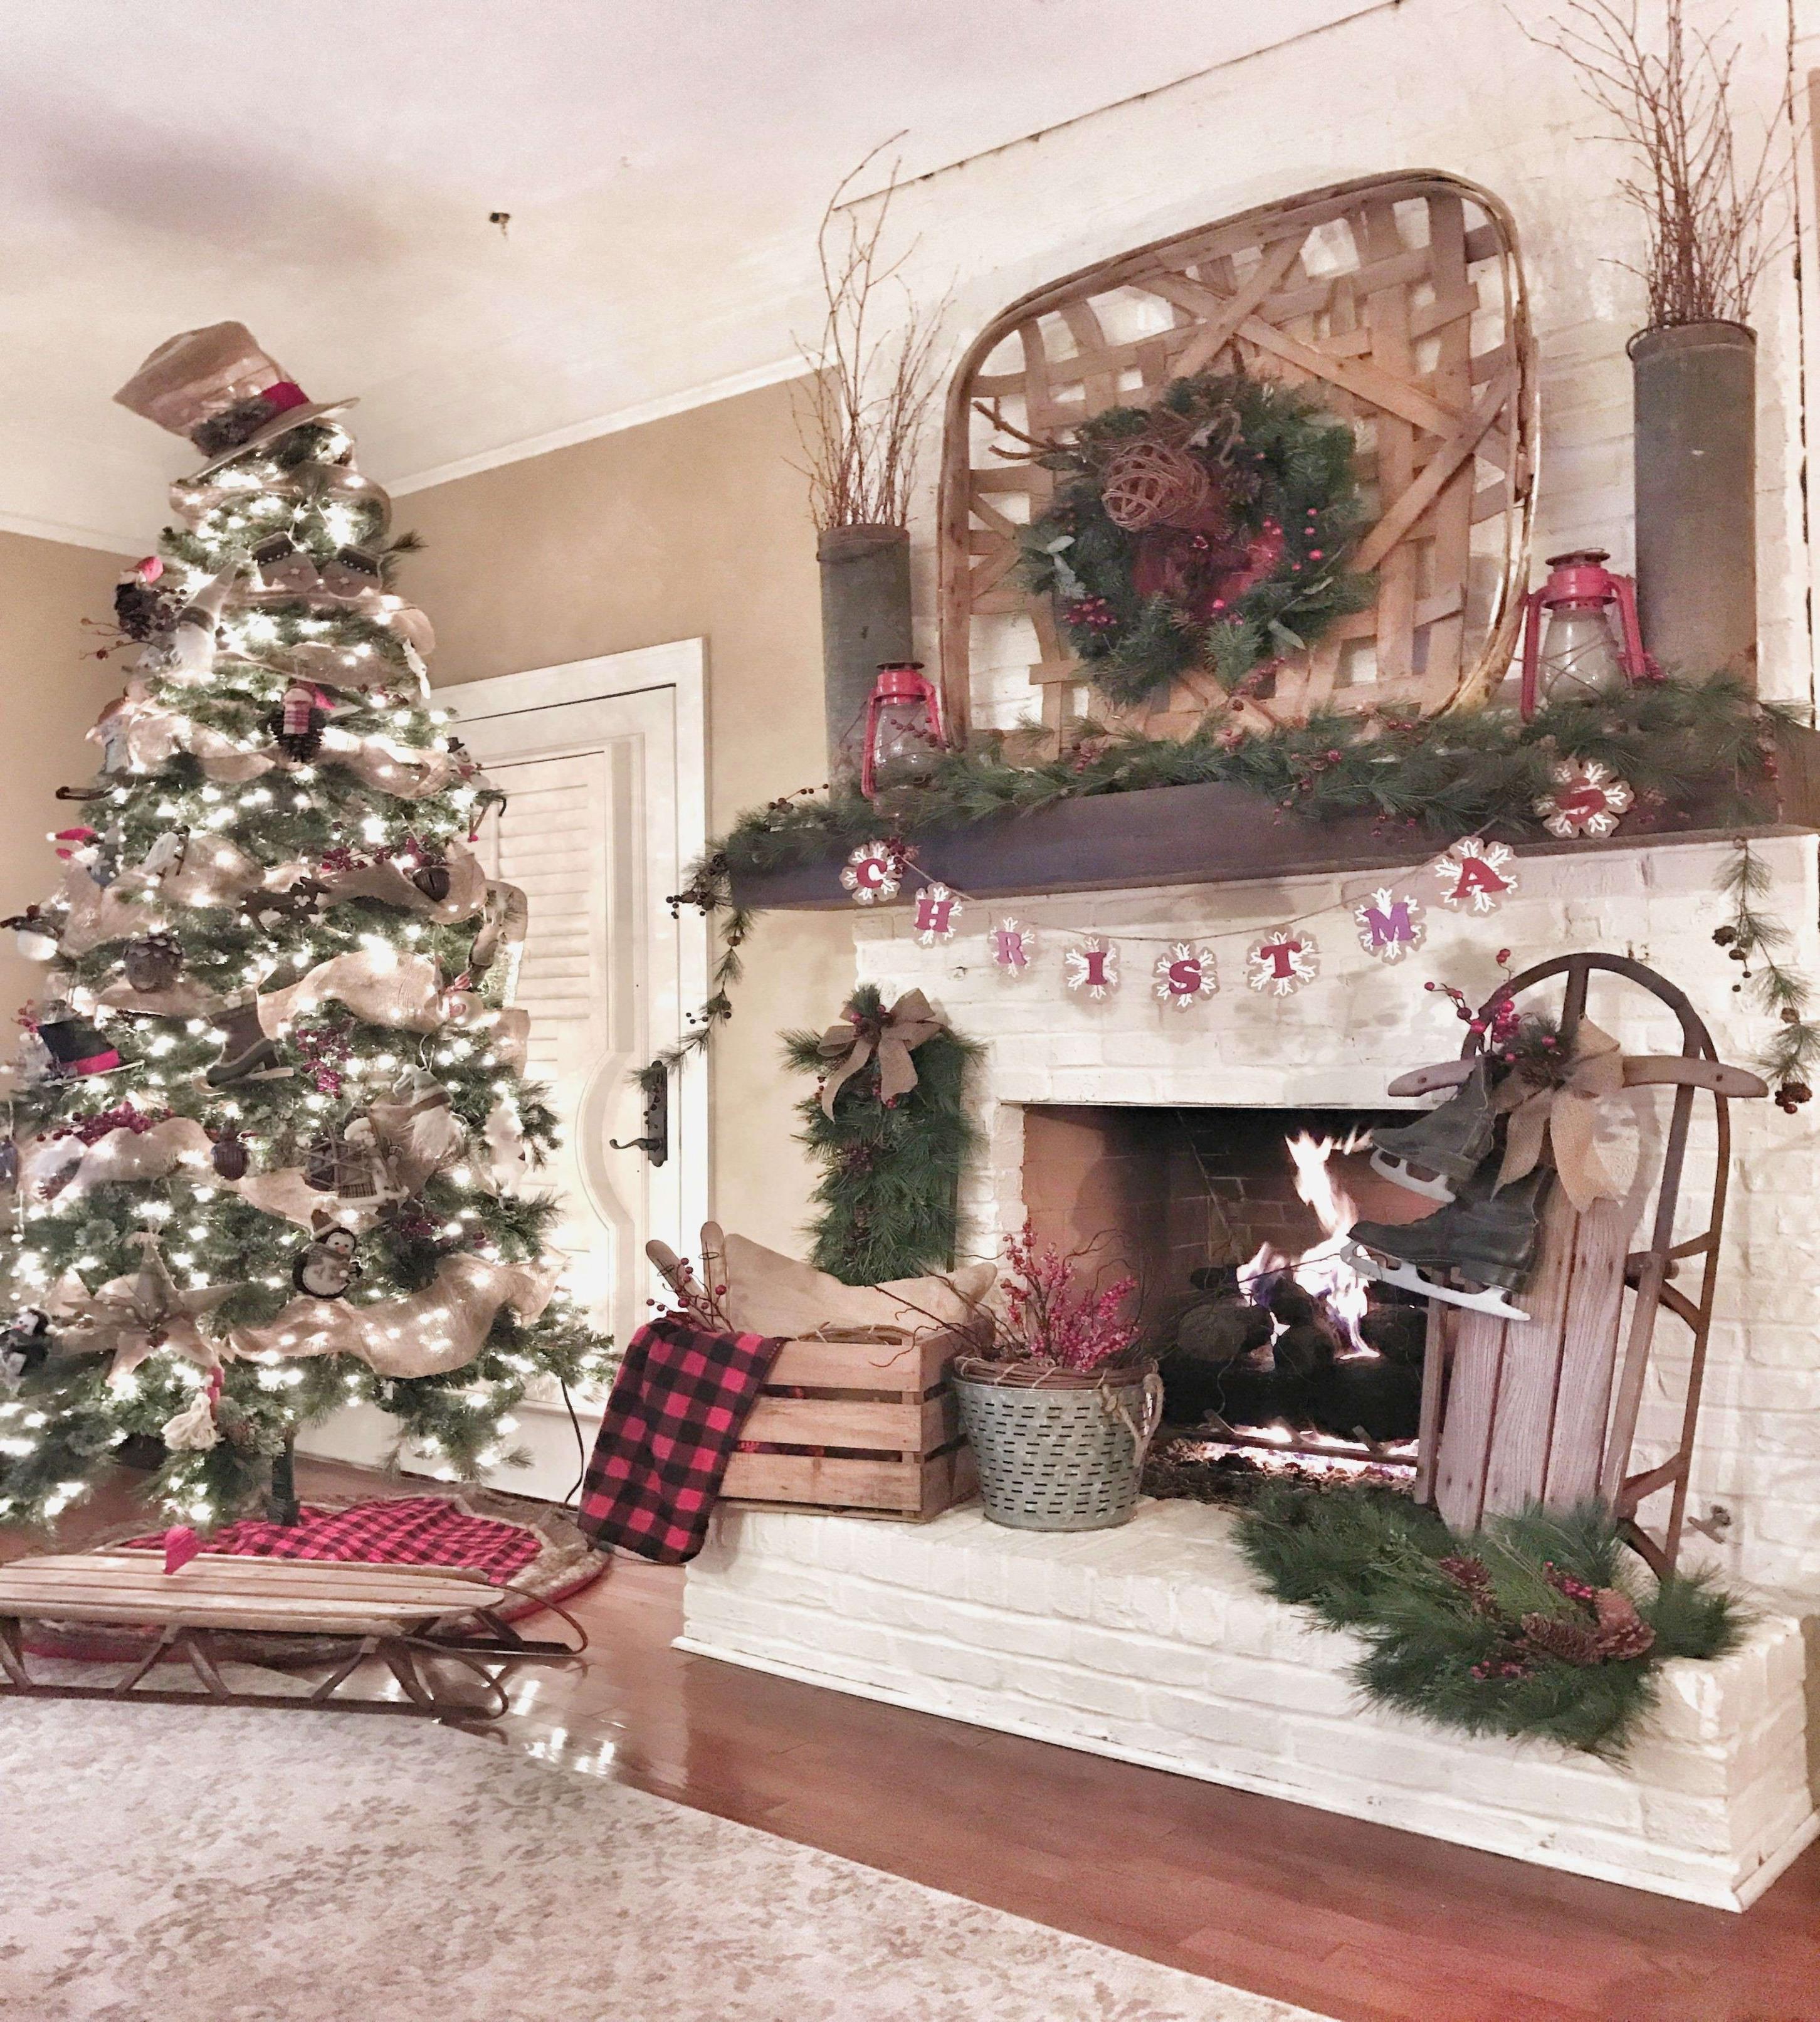 Fireplace ornaments Inspirational Christmas Decorators Luxe Millionnaire